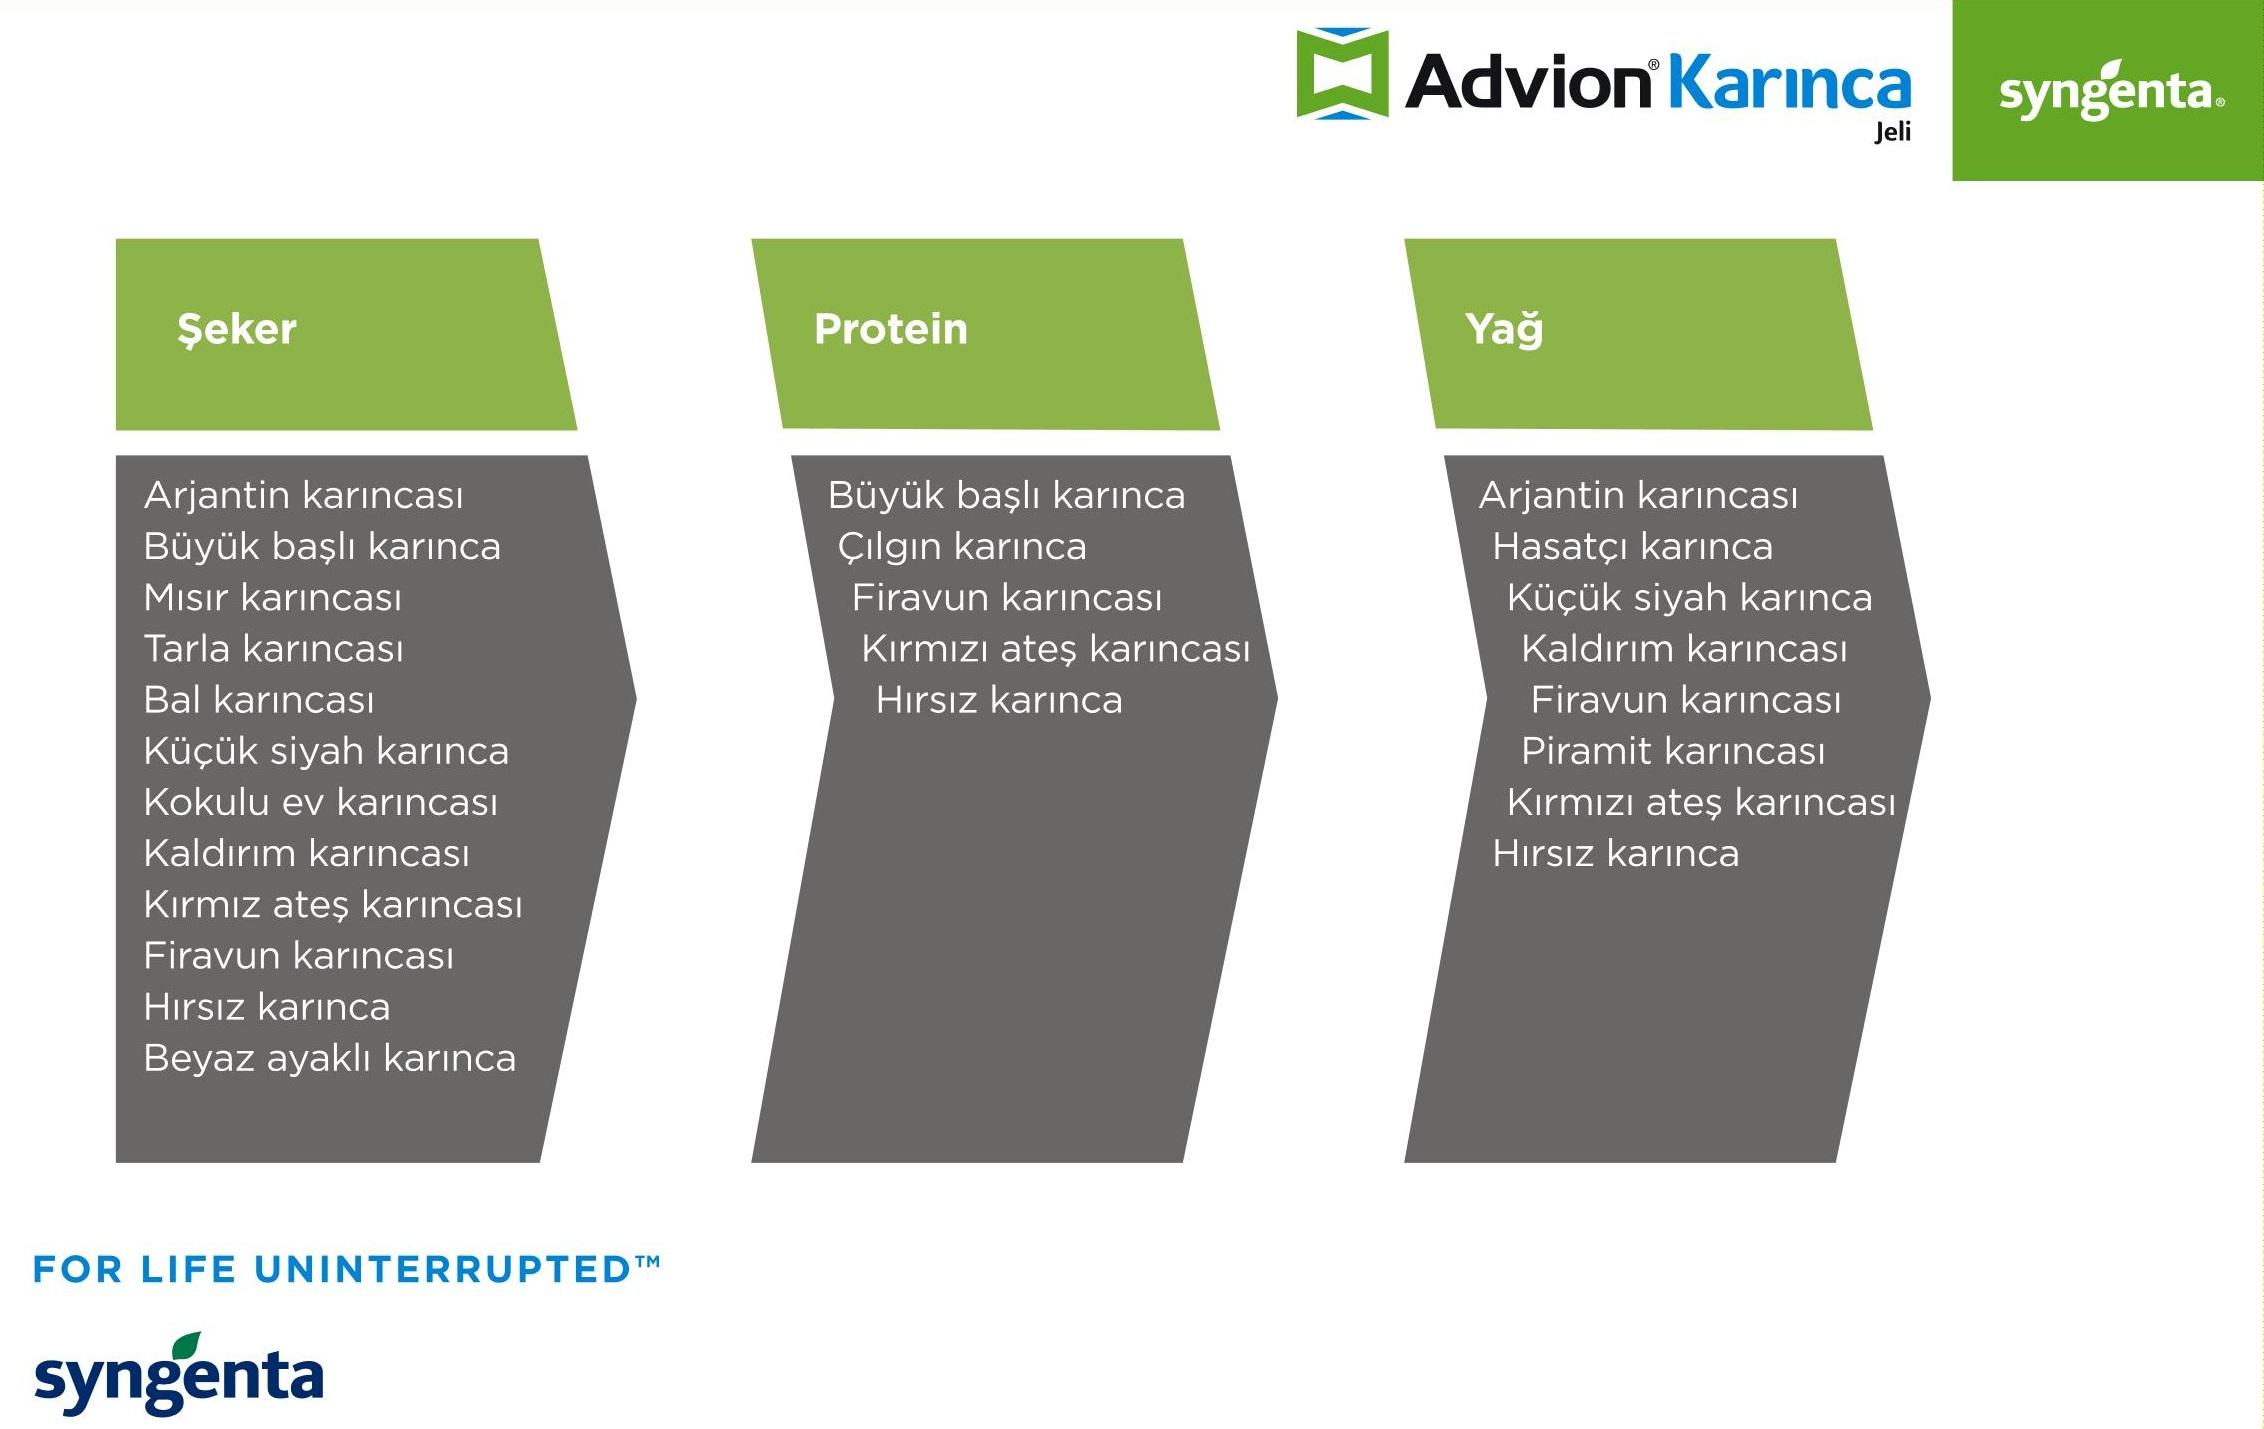 advion_karinca_3